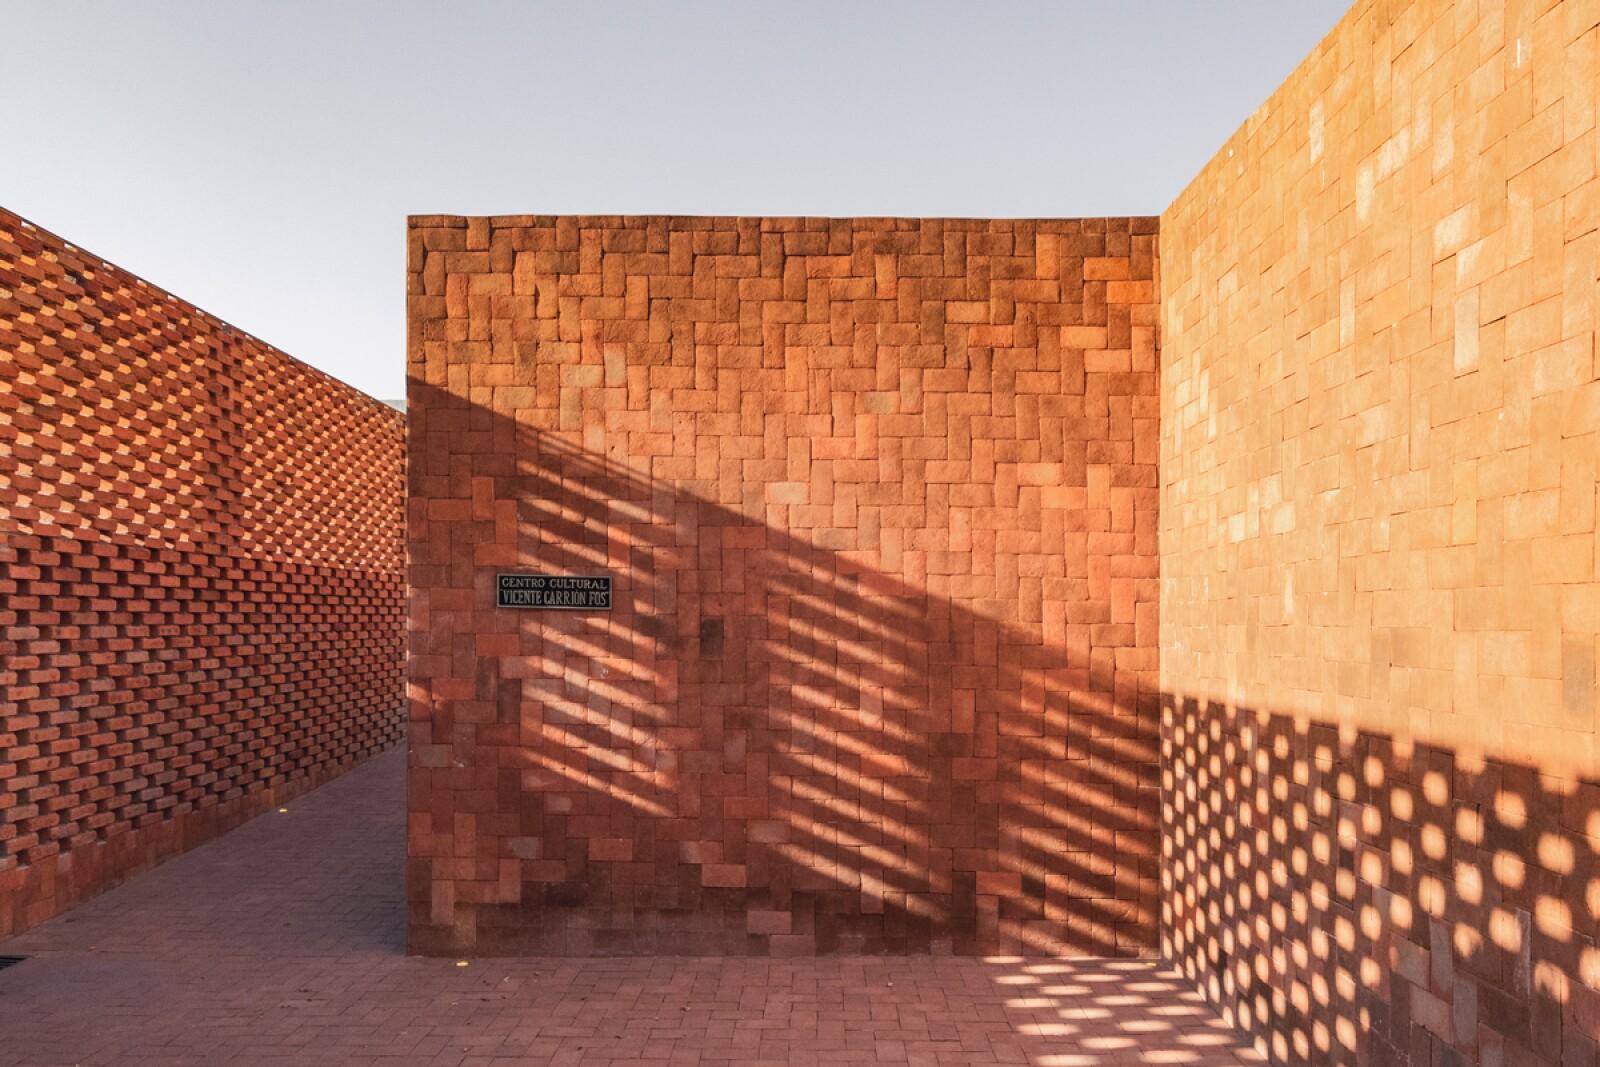 Centro Educativo de Morelia